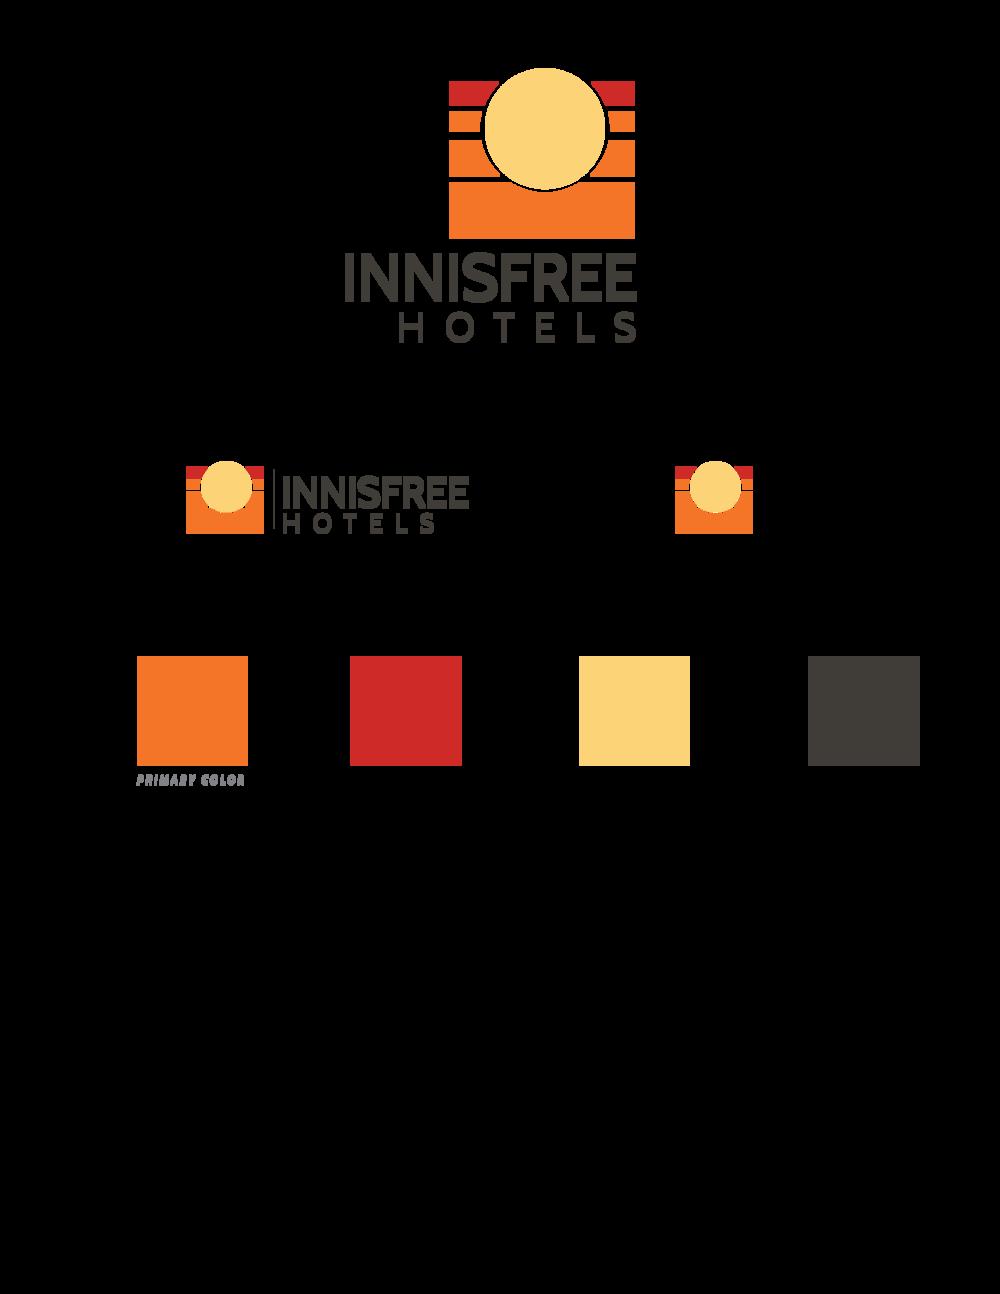 innisfree-hotels-stephanie-m-powell.jpg